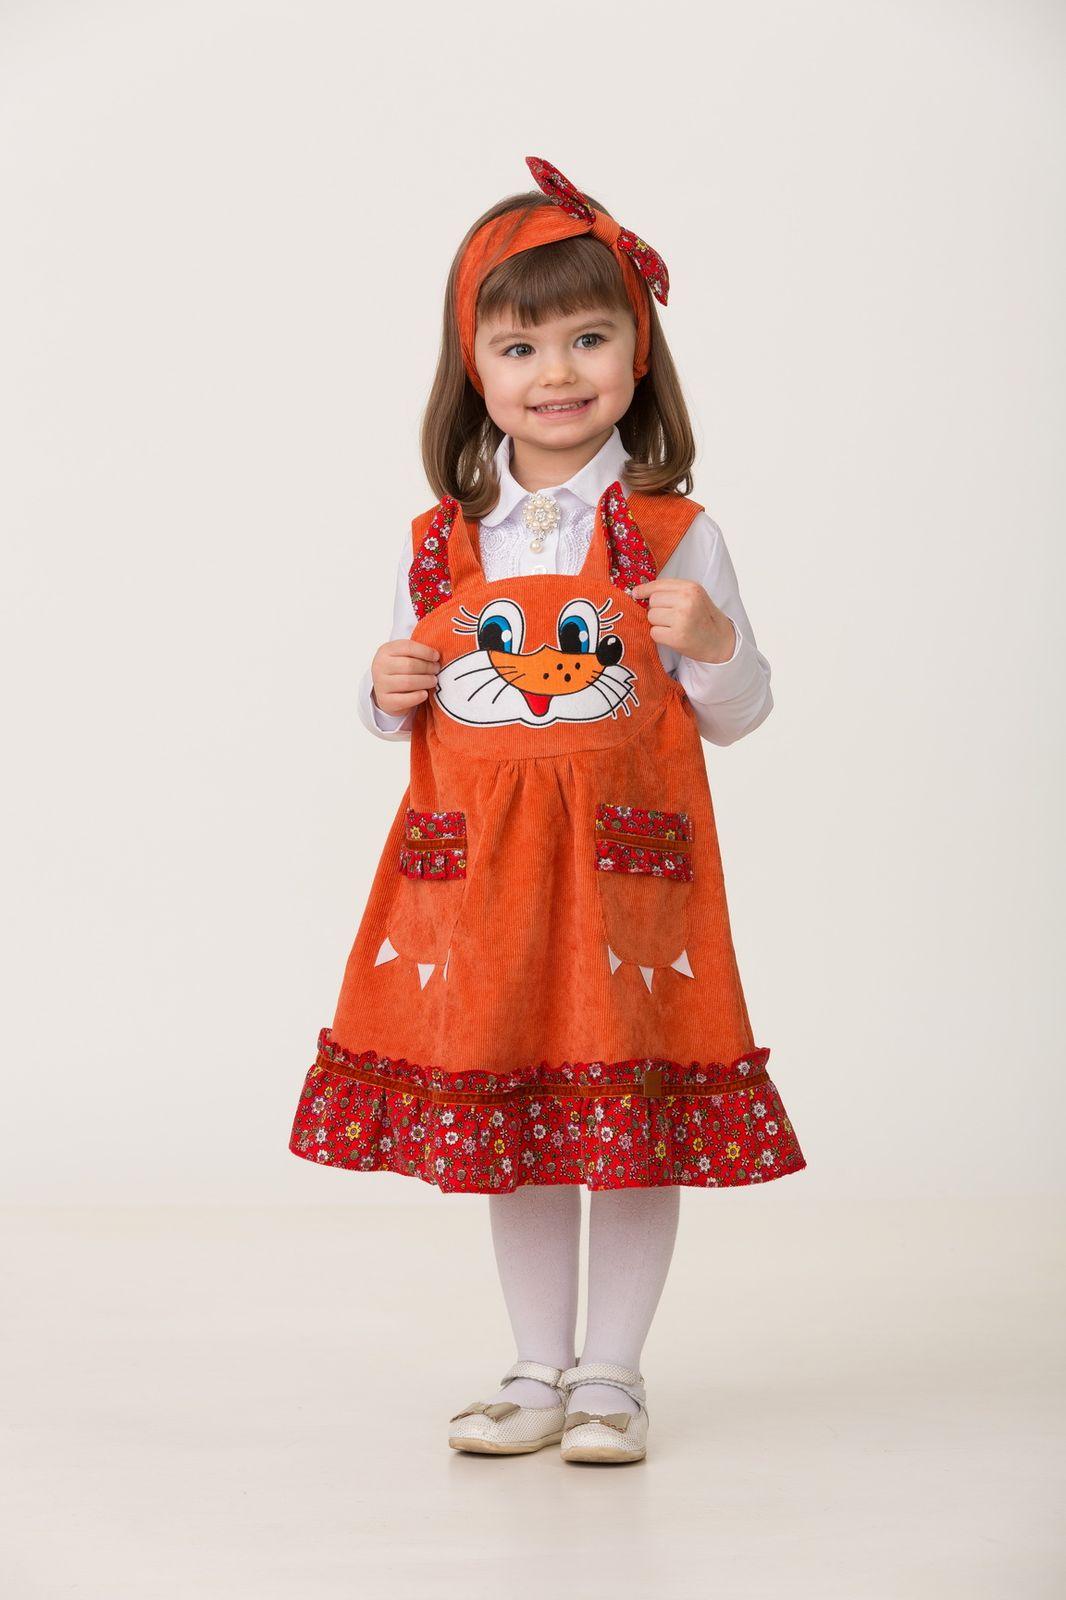 Карнавальный костюм Jeanees Лисичка Лулу, цвет: рыжий. Размер: 24 карнавальный костюм jeanees мышонок масик цвет серый размер 24